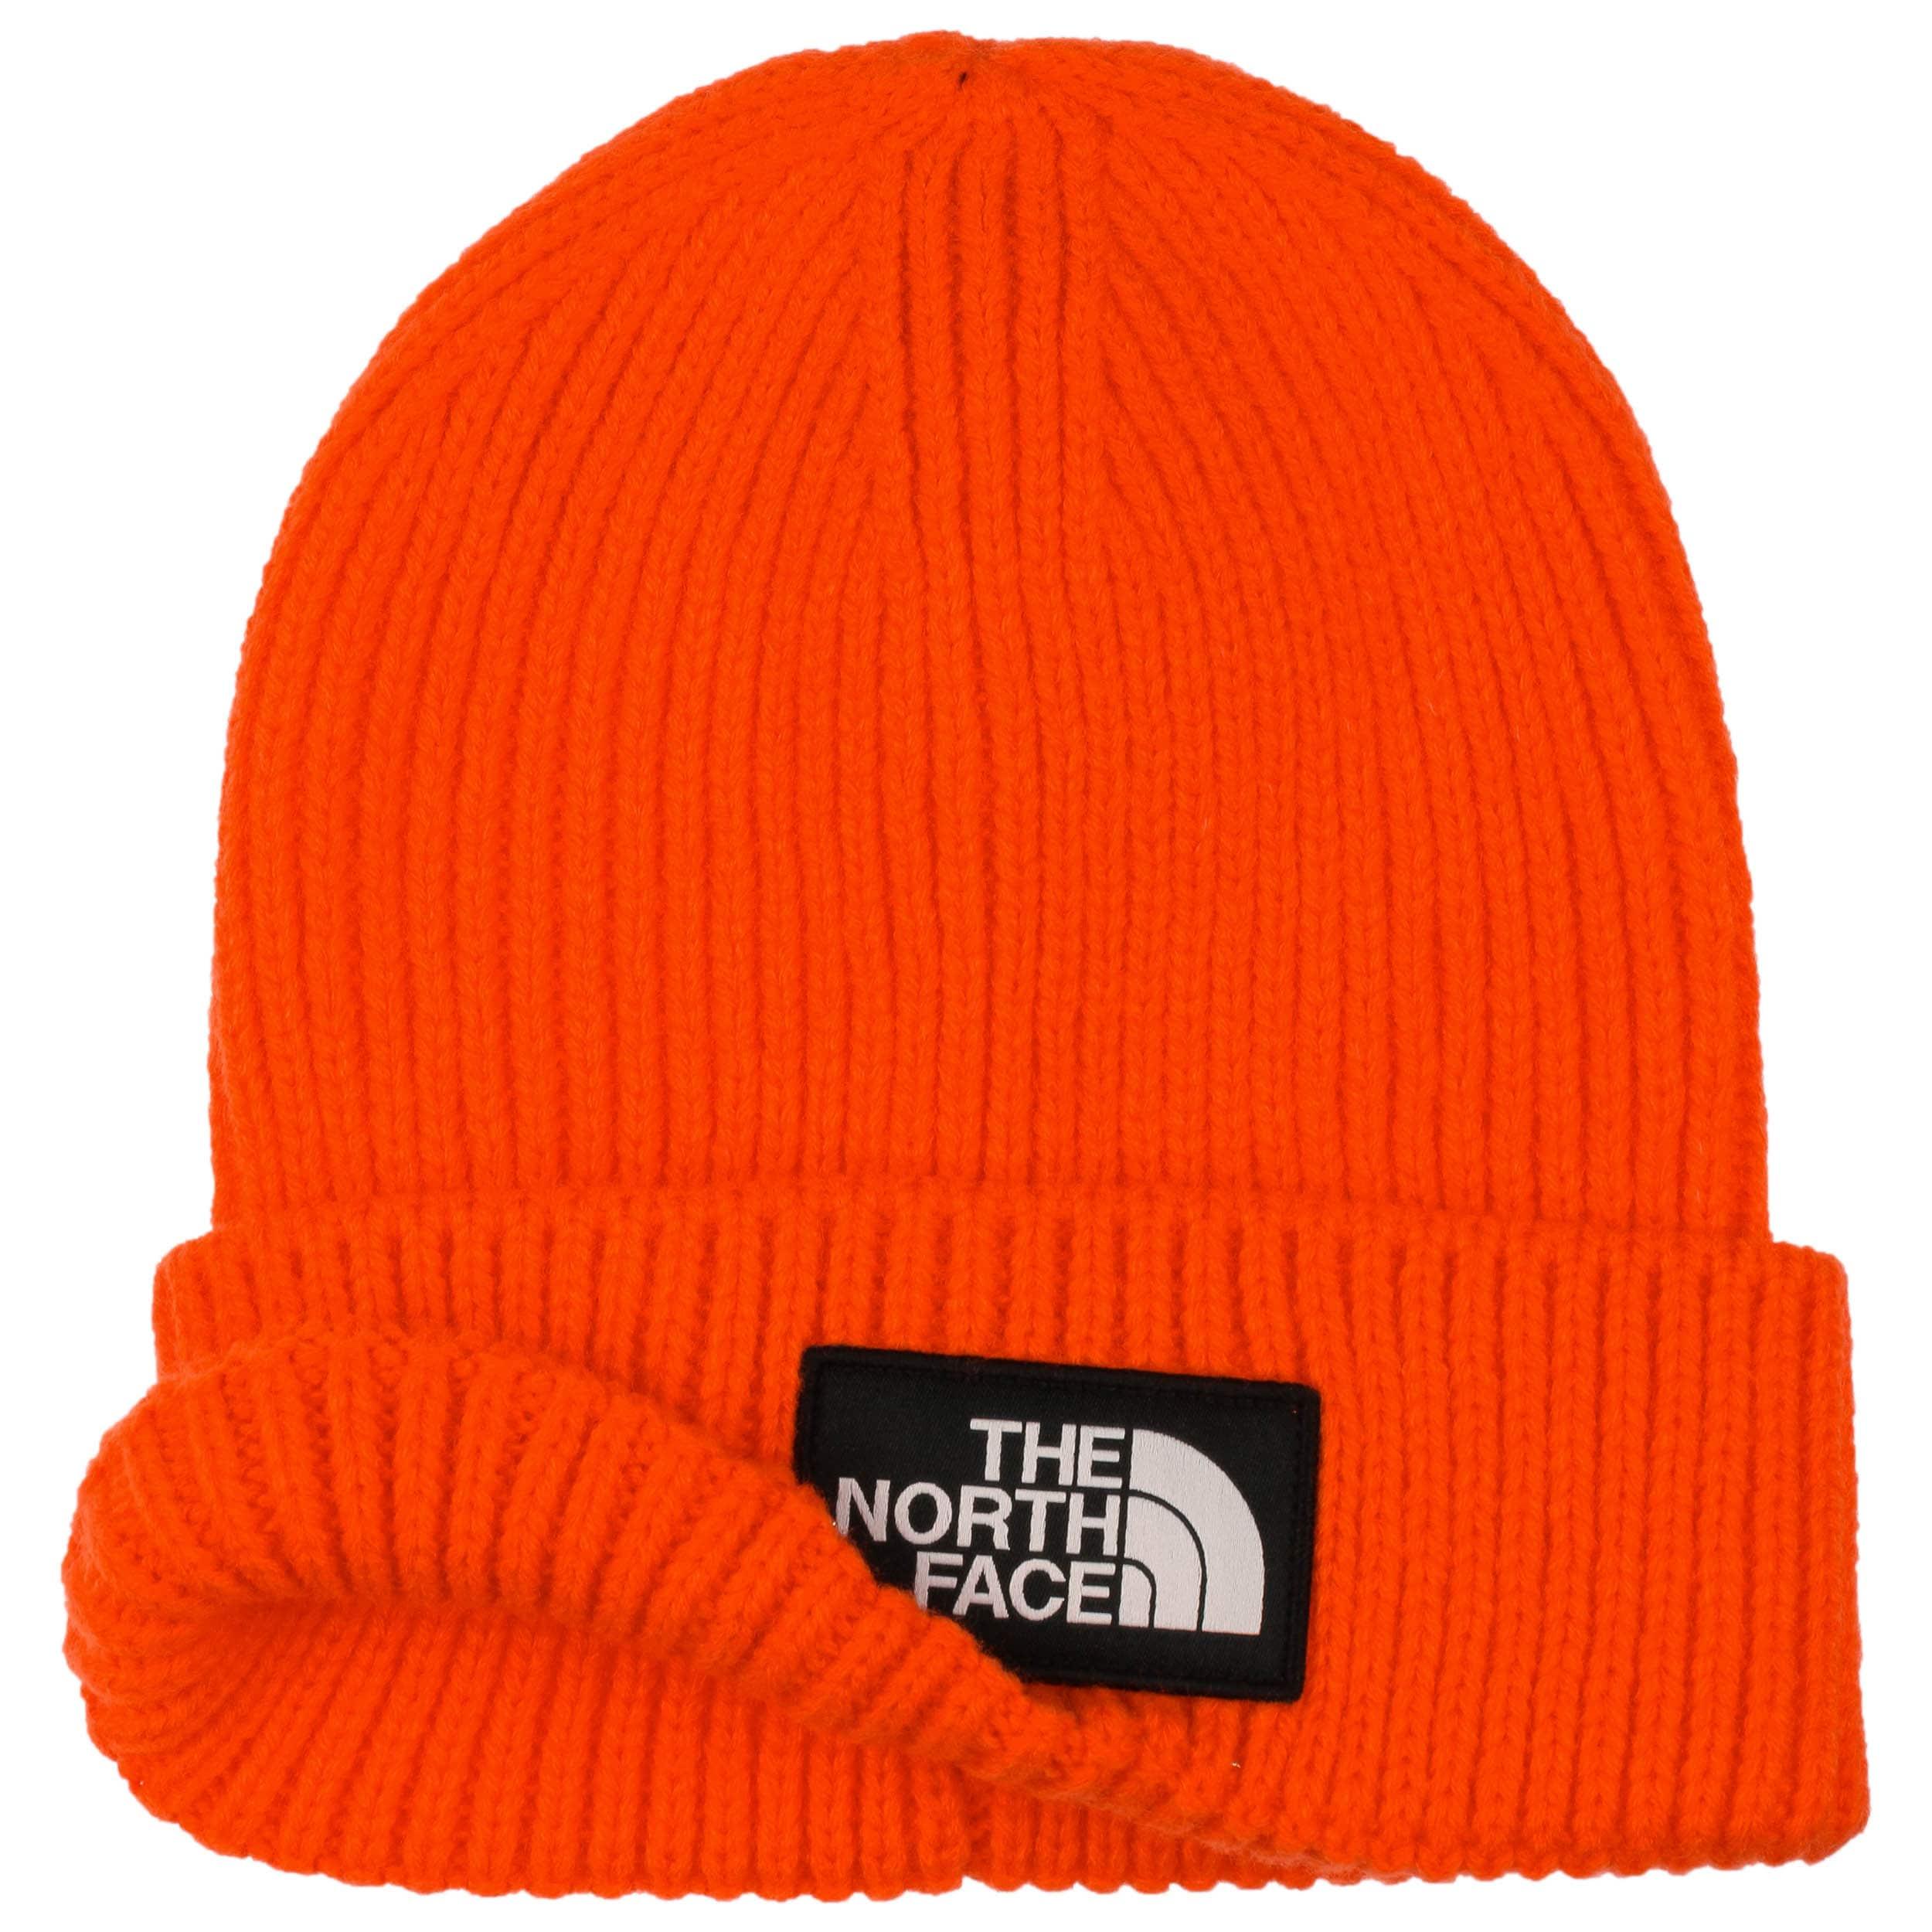 ... Logo Box Beanie Hat by The North Face - orange 1 ... efcbf3d3611